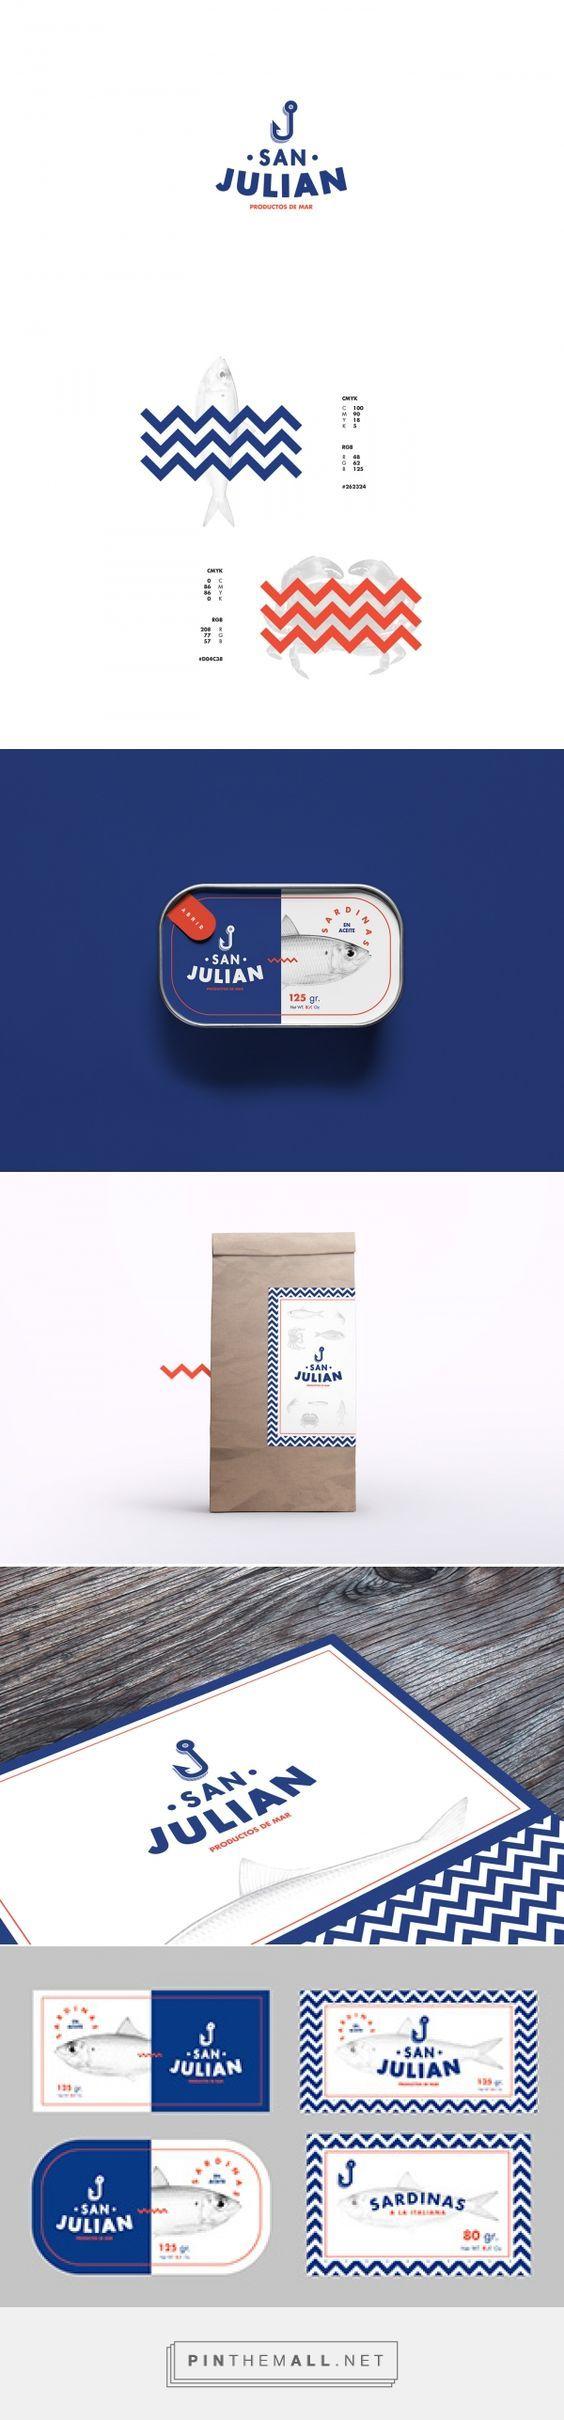 San Julian Branding on Behance